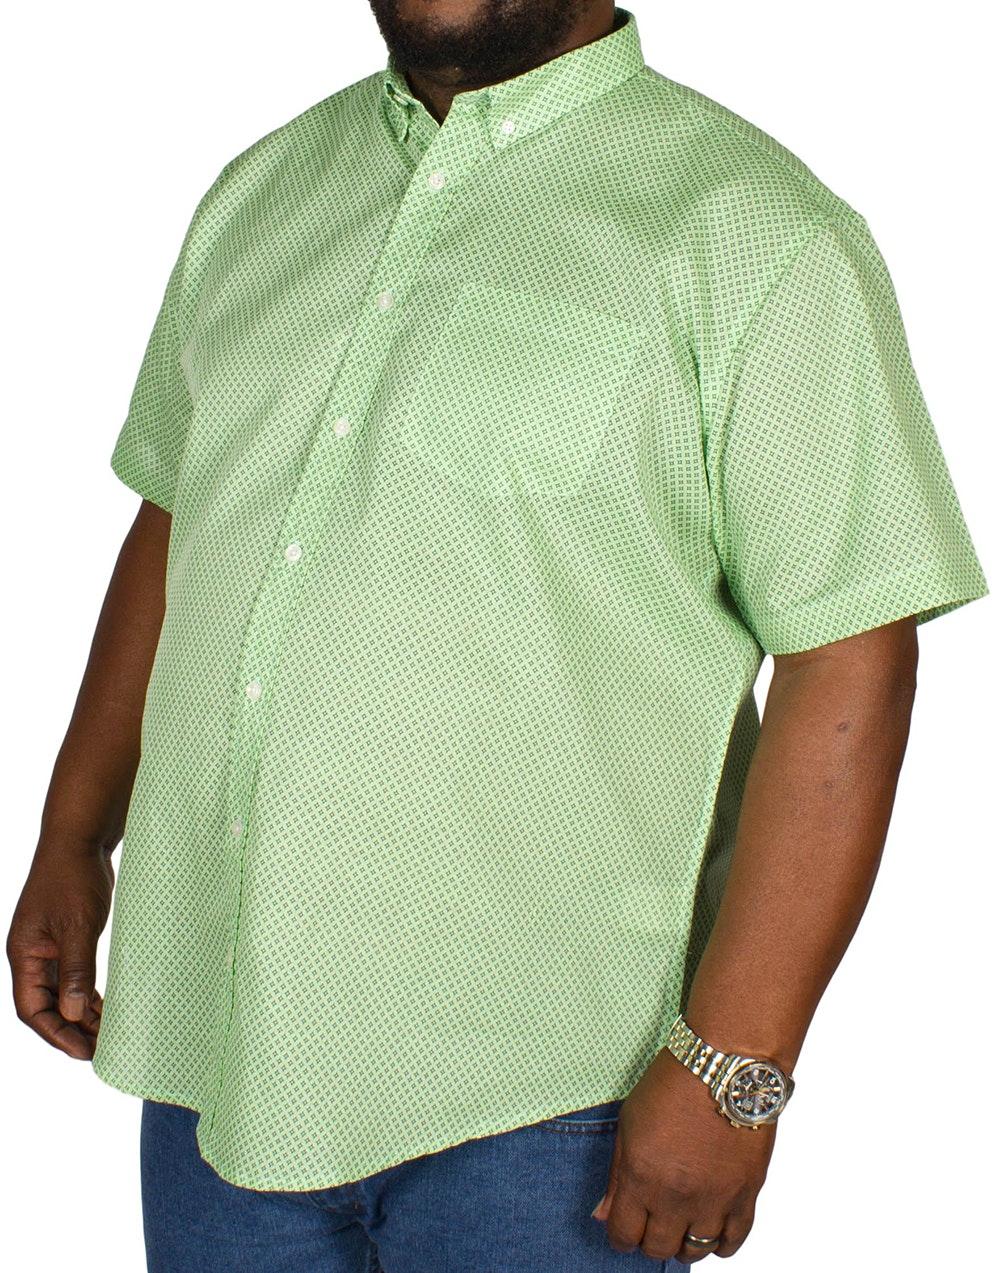 Bigdude All Over Geometric Print Shirt Green